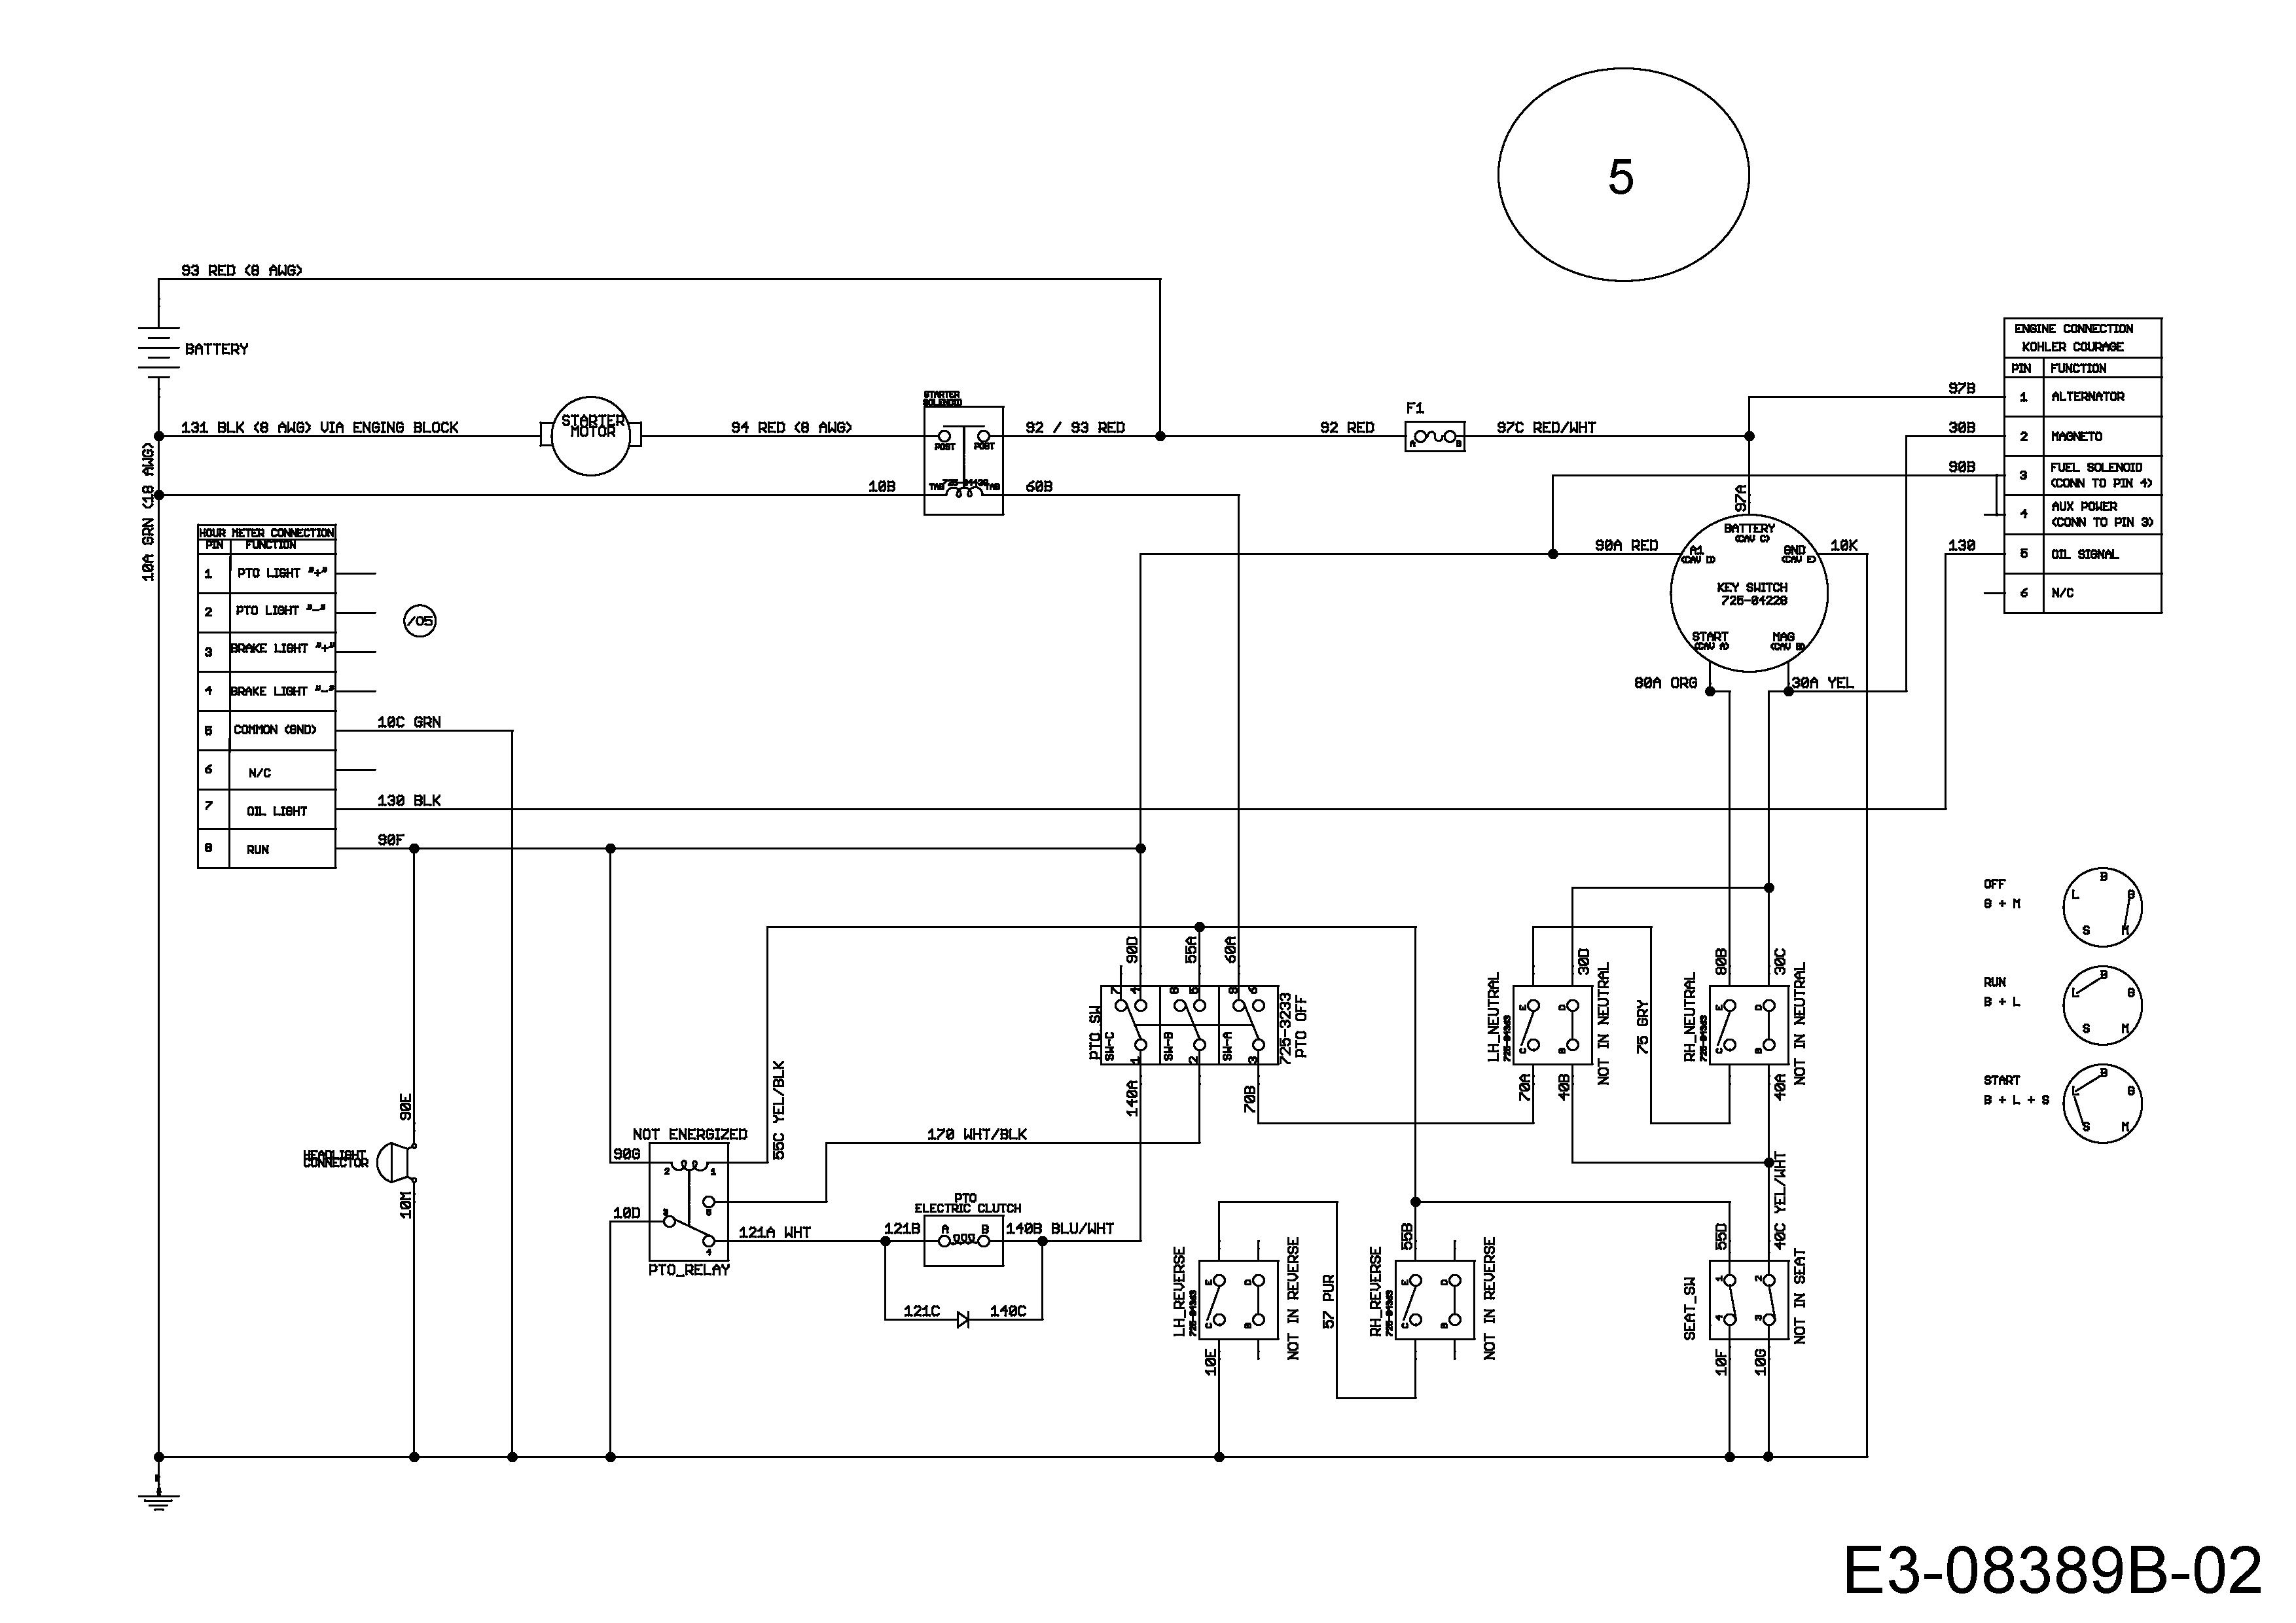 Massey Ferguson Xt1644 Zero Turn Mower Wiring Diagram